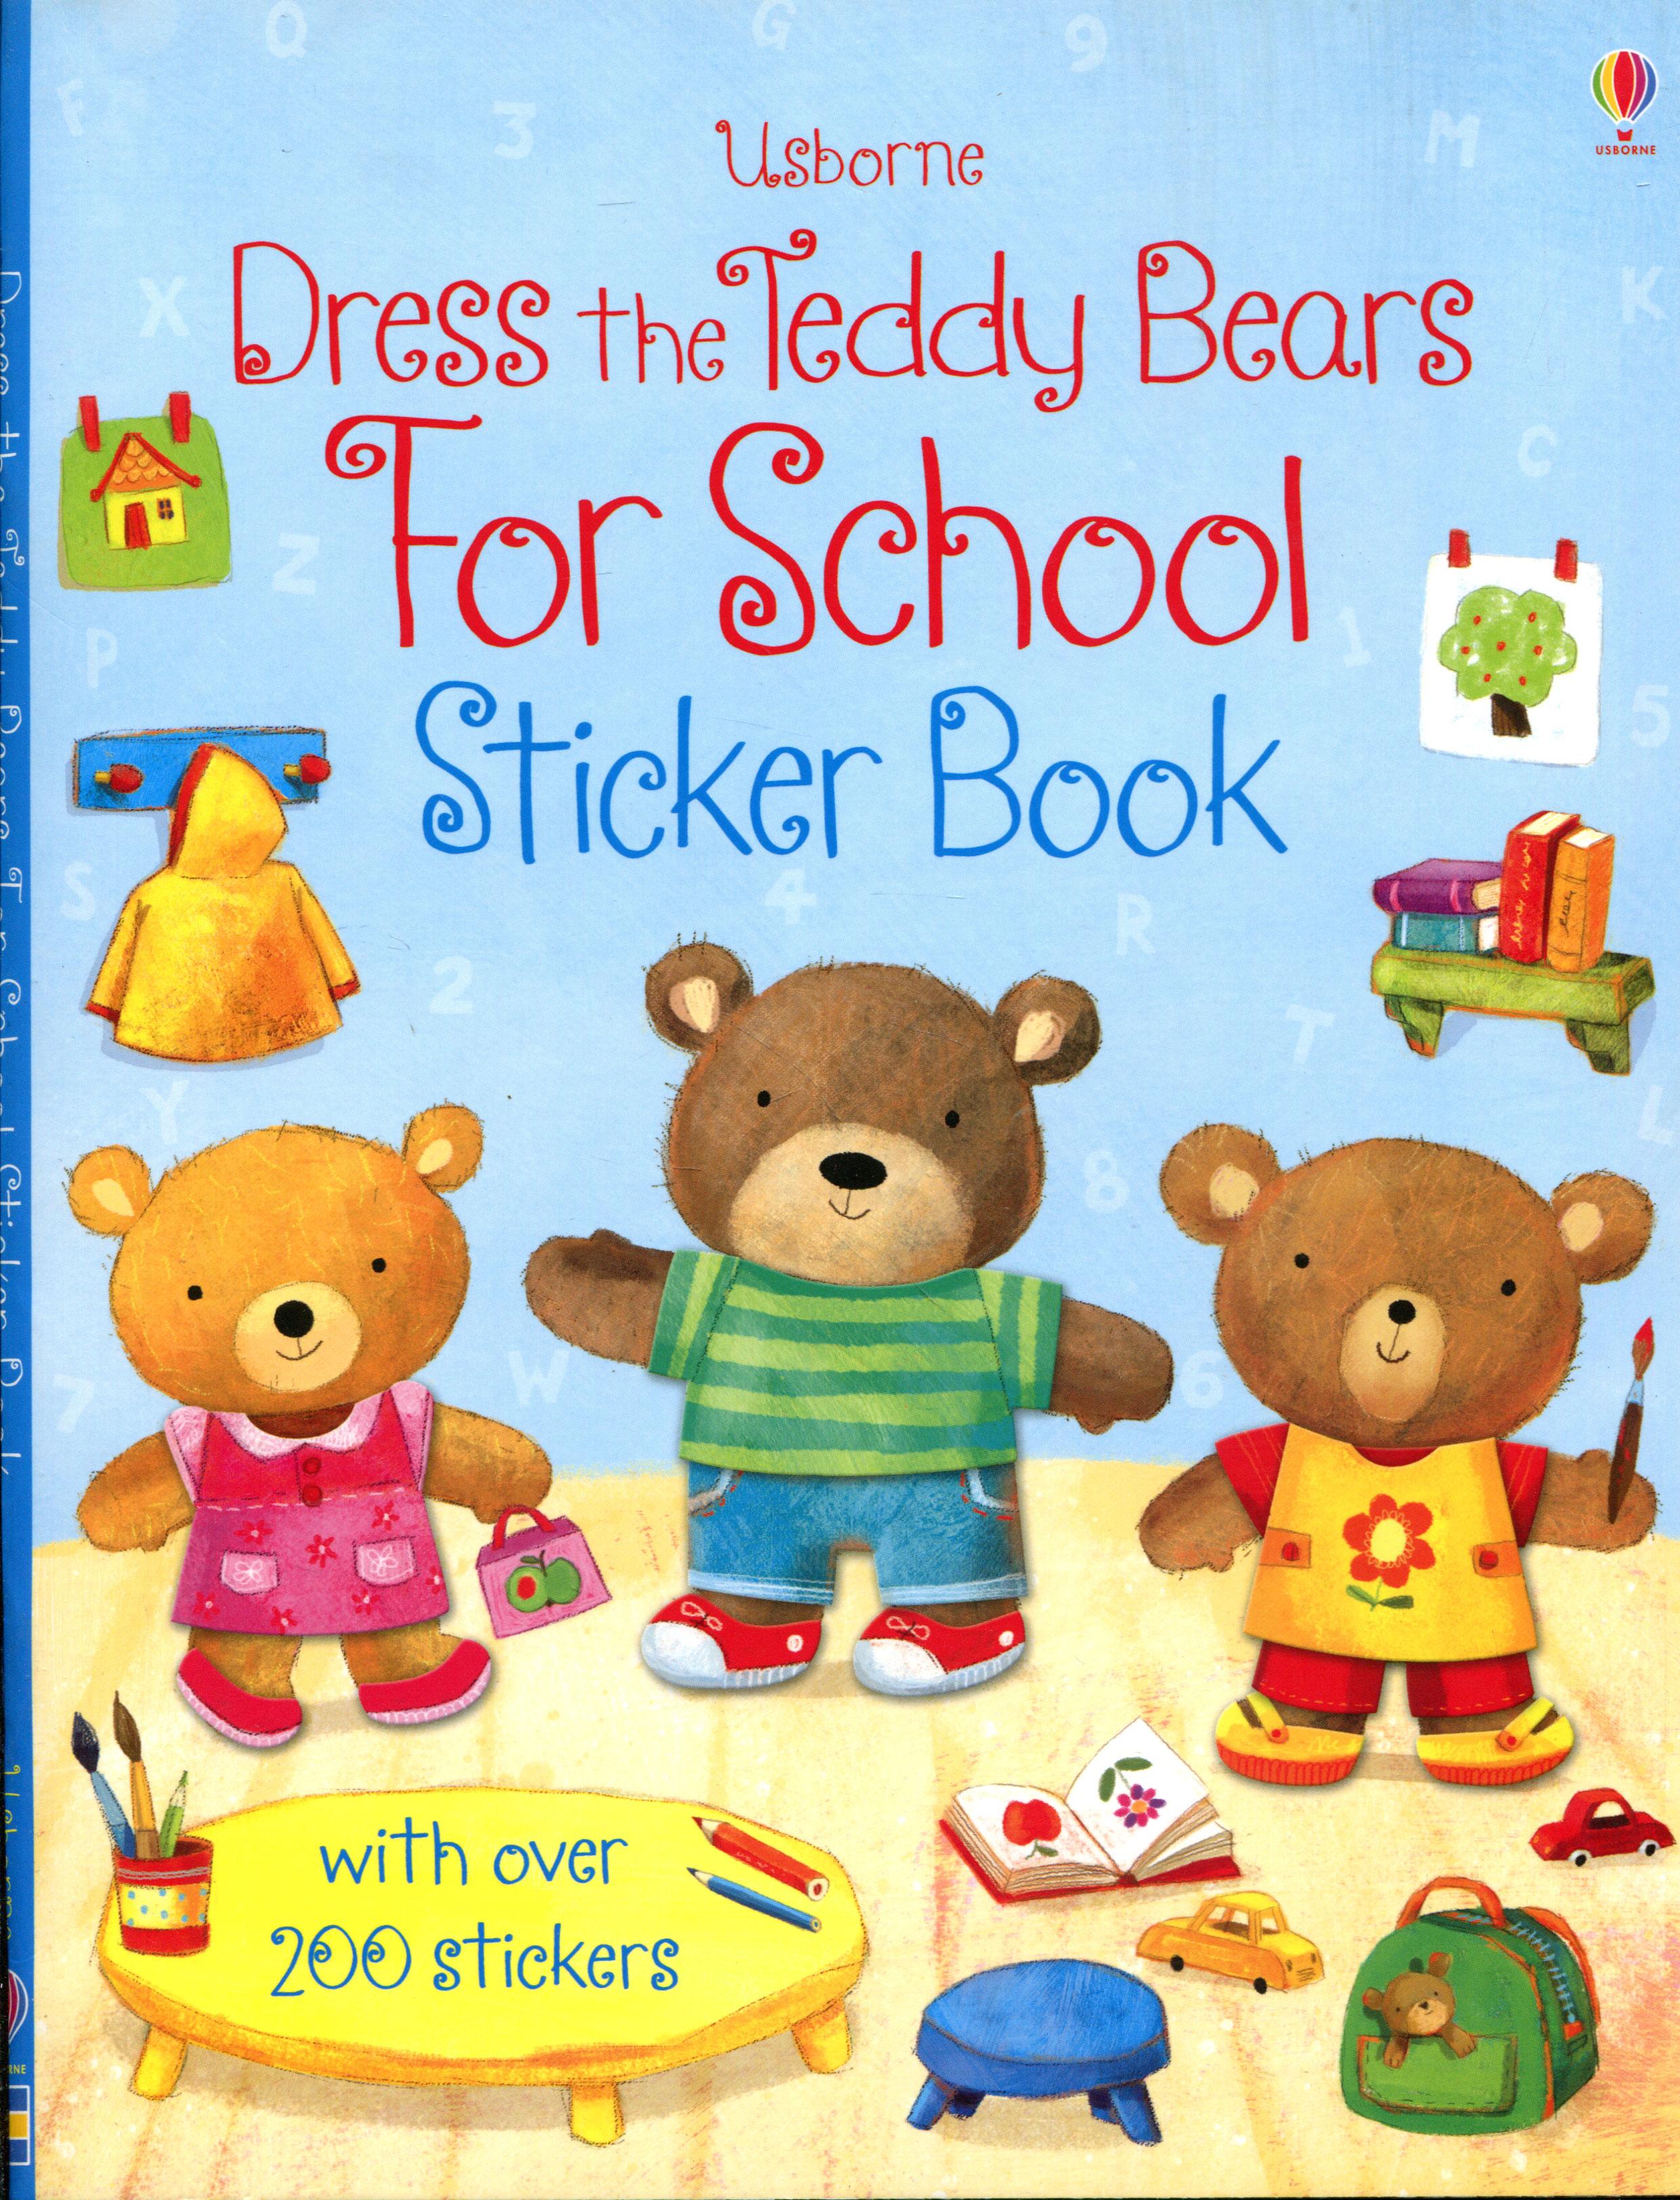 Dress the Teddy Bears for School: Sticker Book